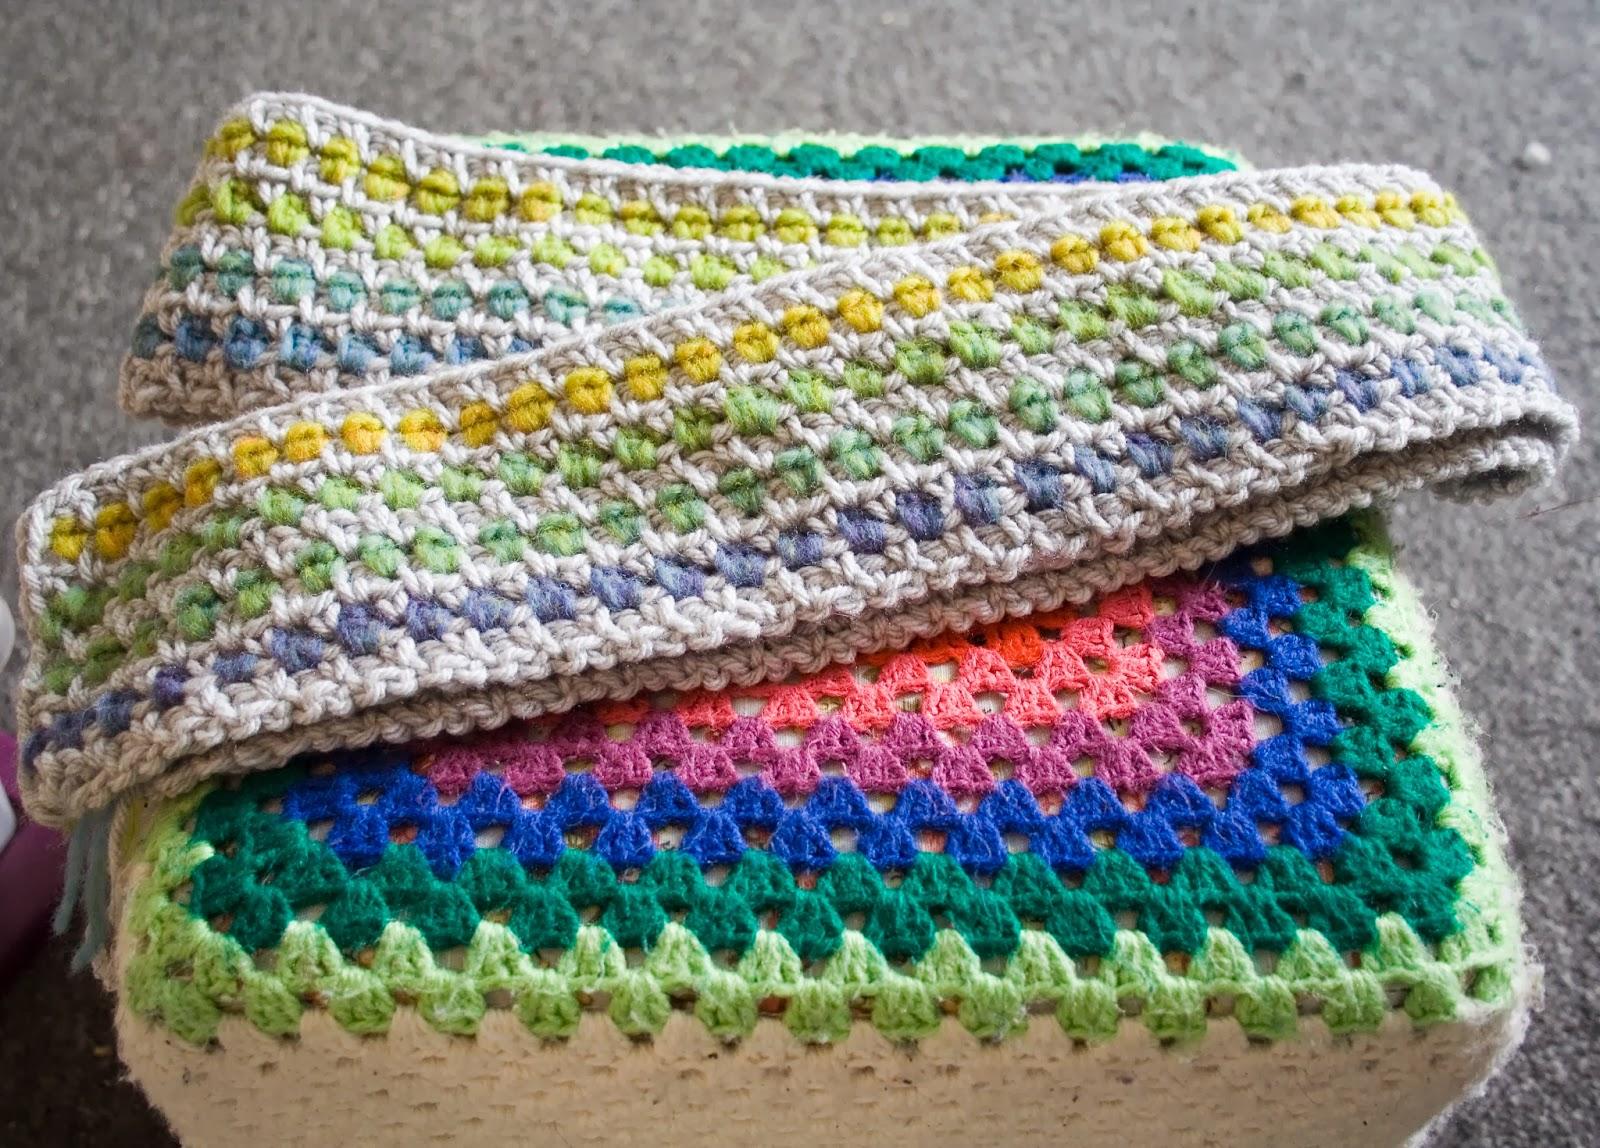 Crochet K Stitch : Hazels Crochet: Funky Stitch Scarf